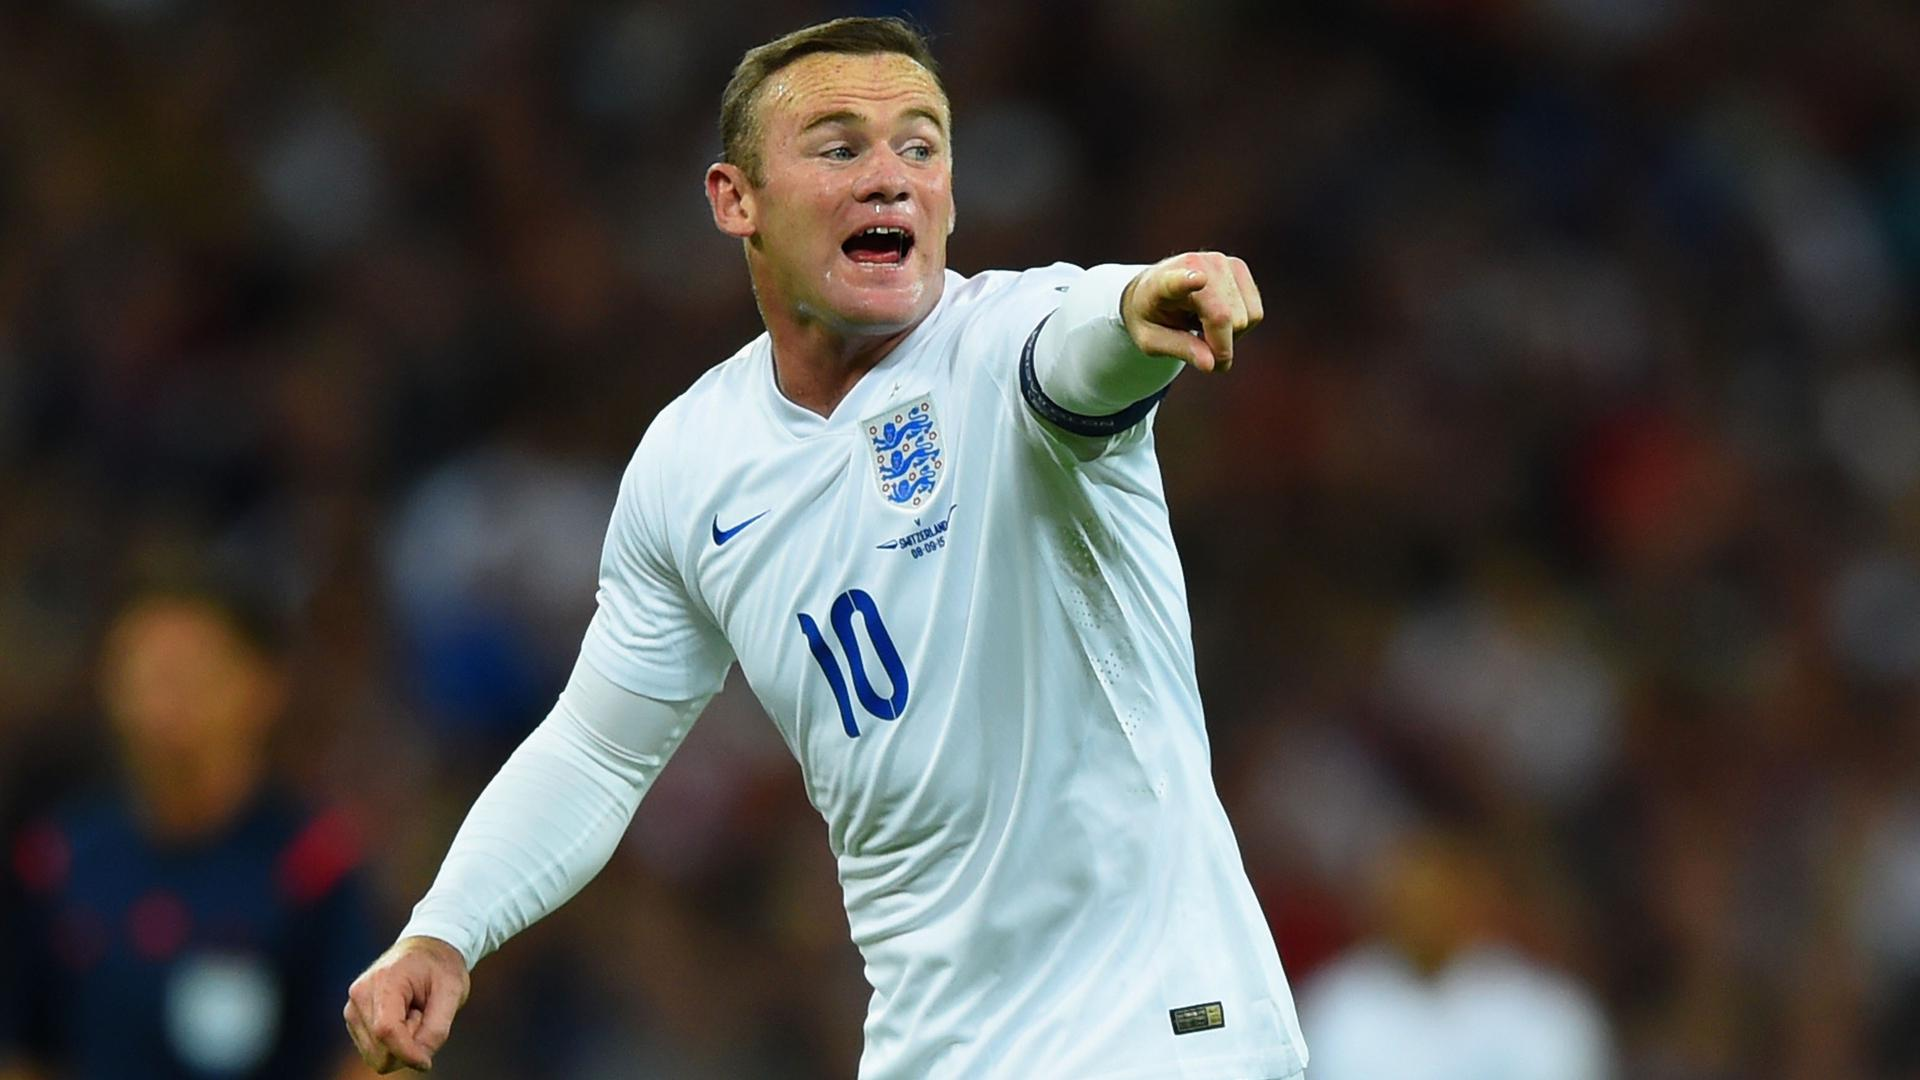 rooney-1000 Ντριπλάροντας την εφορία - Πώς ξεγλιστρούν οι παγκόσμιοι αστέρες του ποδοσφαίρου